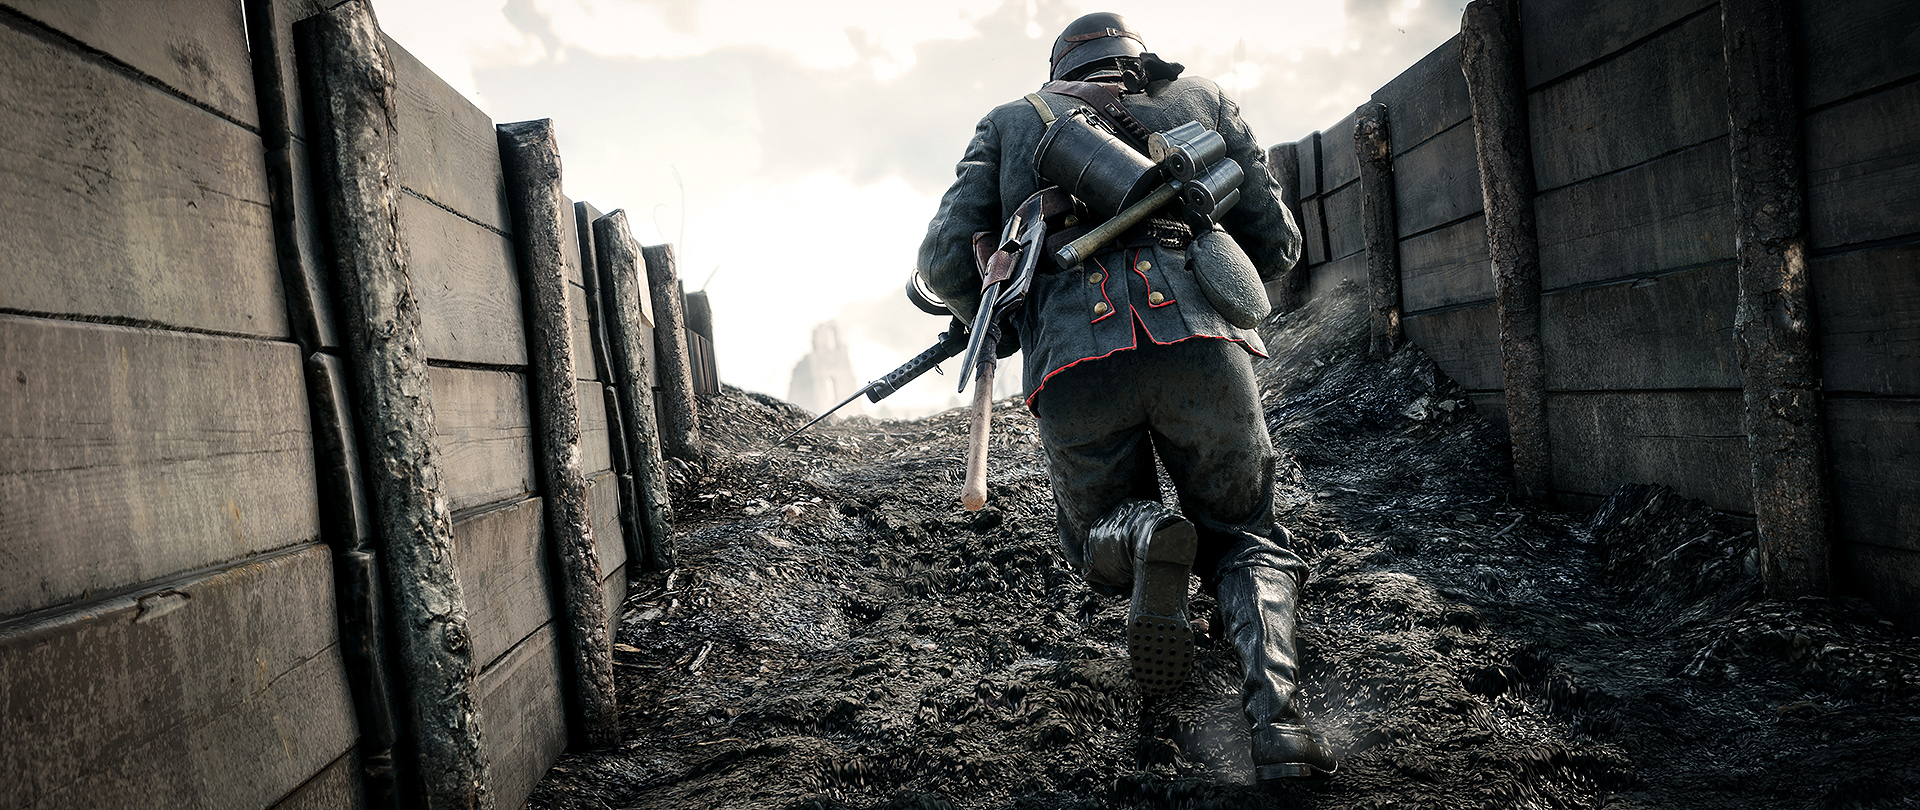 Battlefield 1 War Video Game Hd Wallpaper: 2048x1152 Battlefield 1 Full HD 2048x1152 Resolution HD 4k